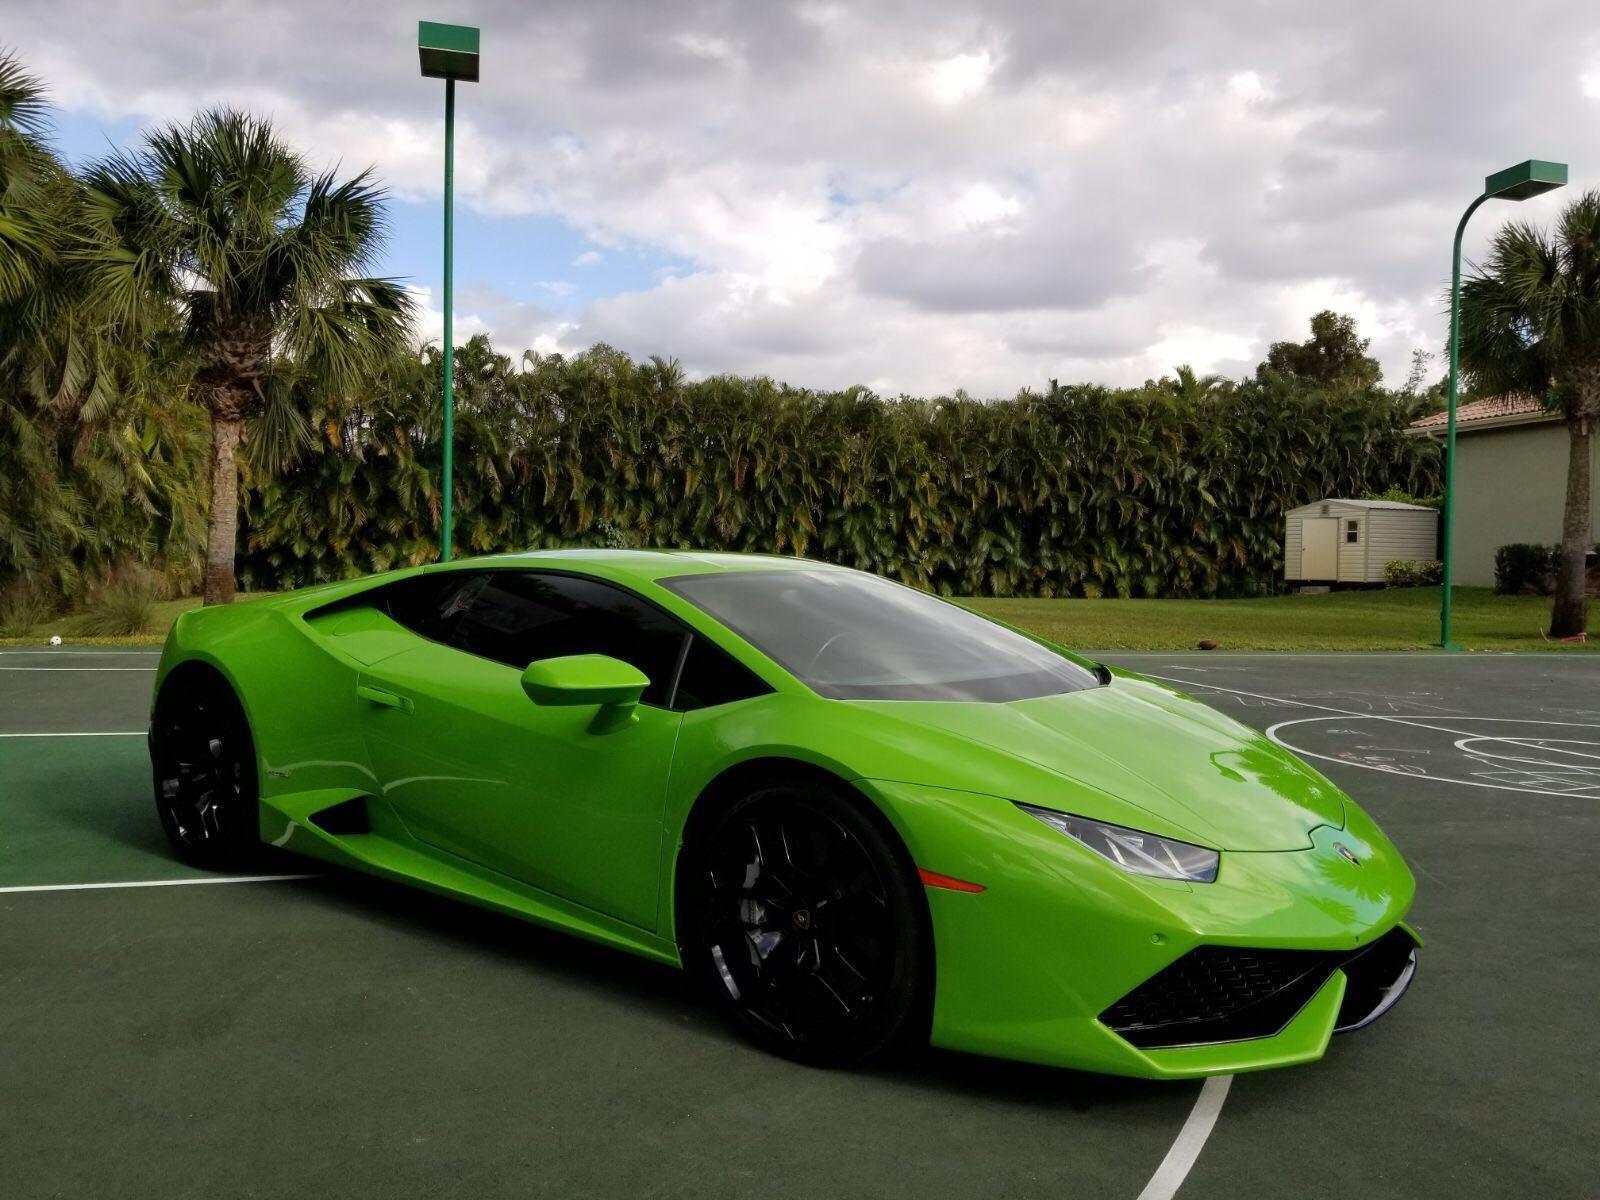 2015 Lamborghini Huracan Stock # A01599 for sale near ...